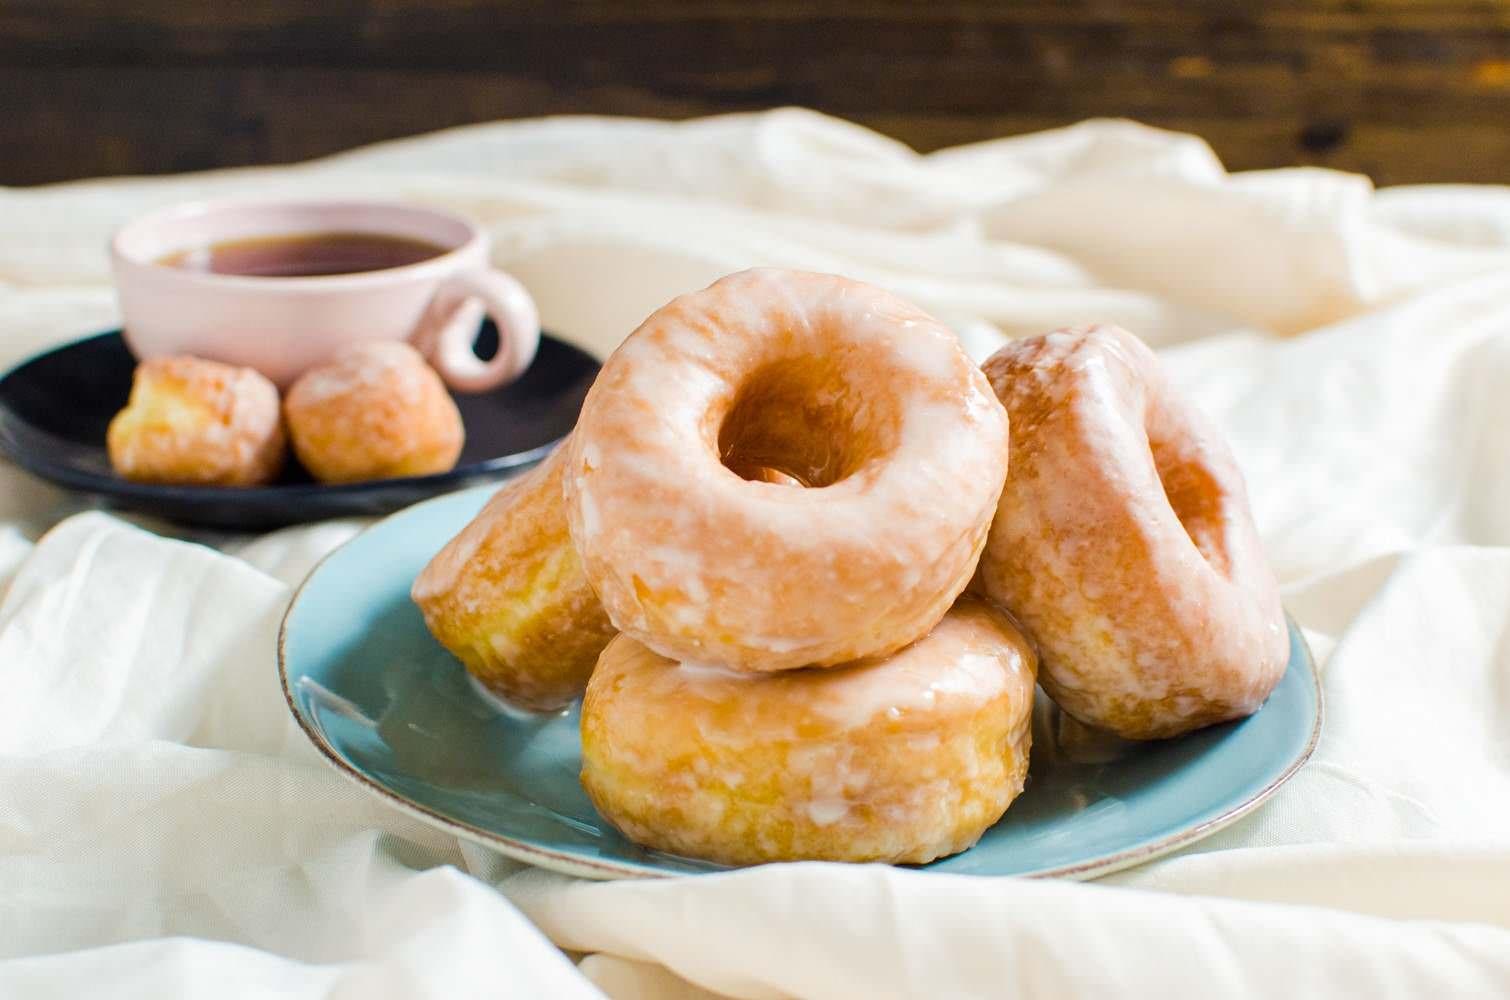 How To Make Perfect Doughnuts Doughnut Troubleshooting